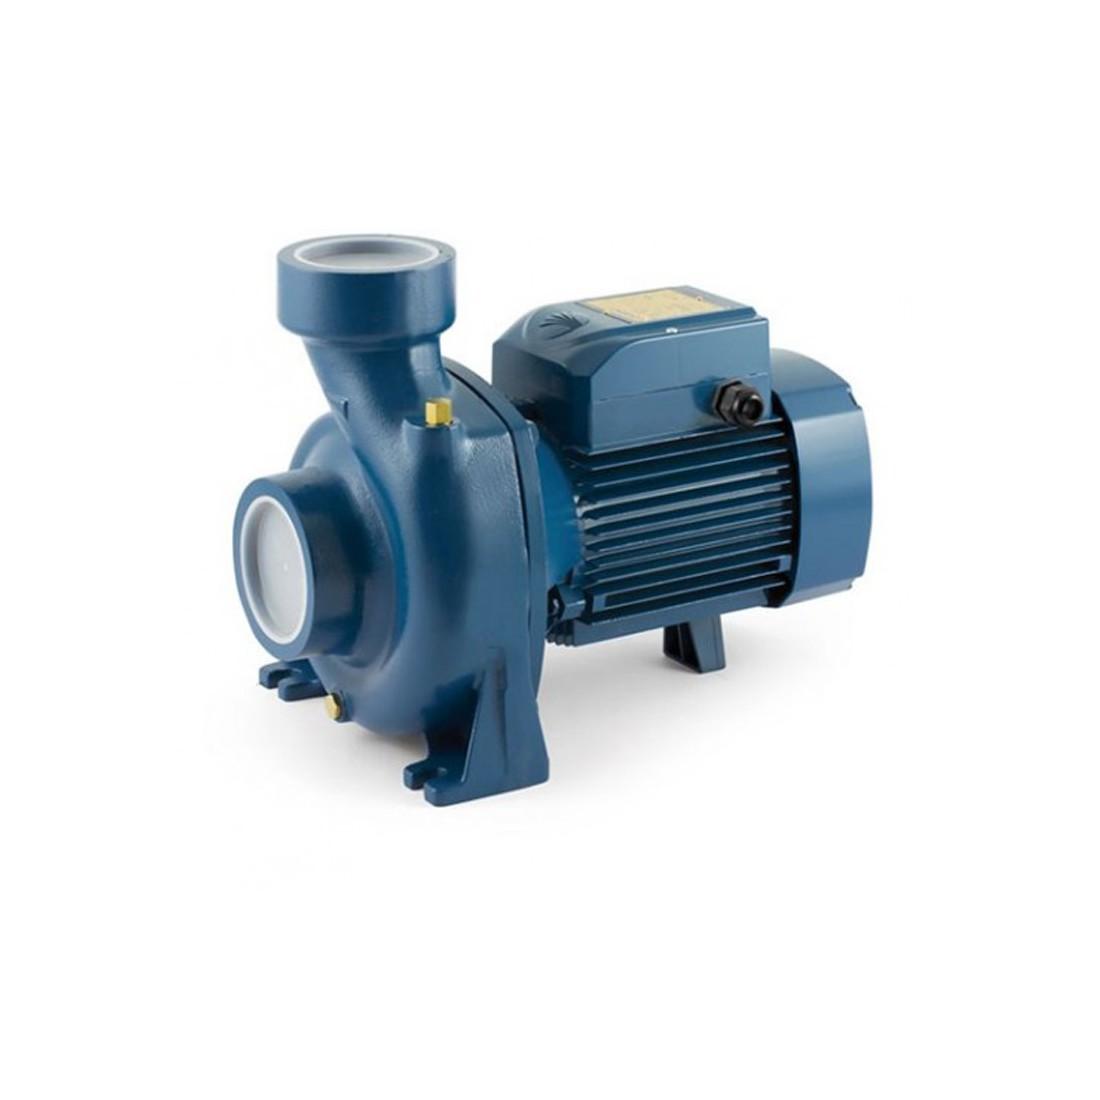 Pompa de suprafata centrifugala Pedrollo HFm 6C monofazata